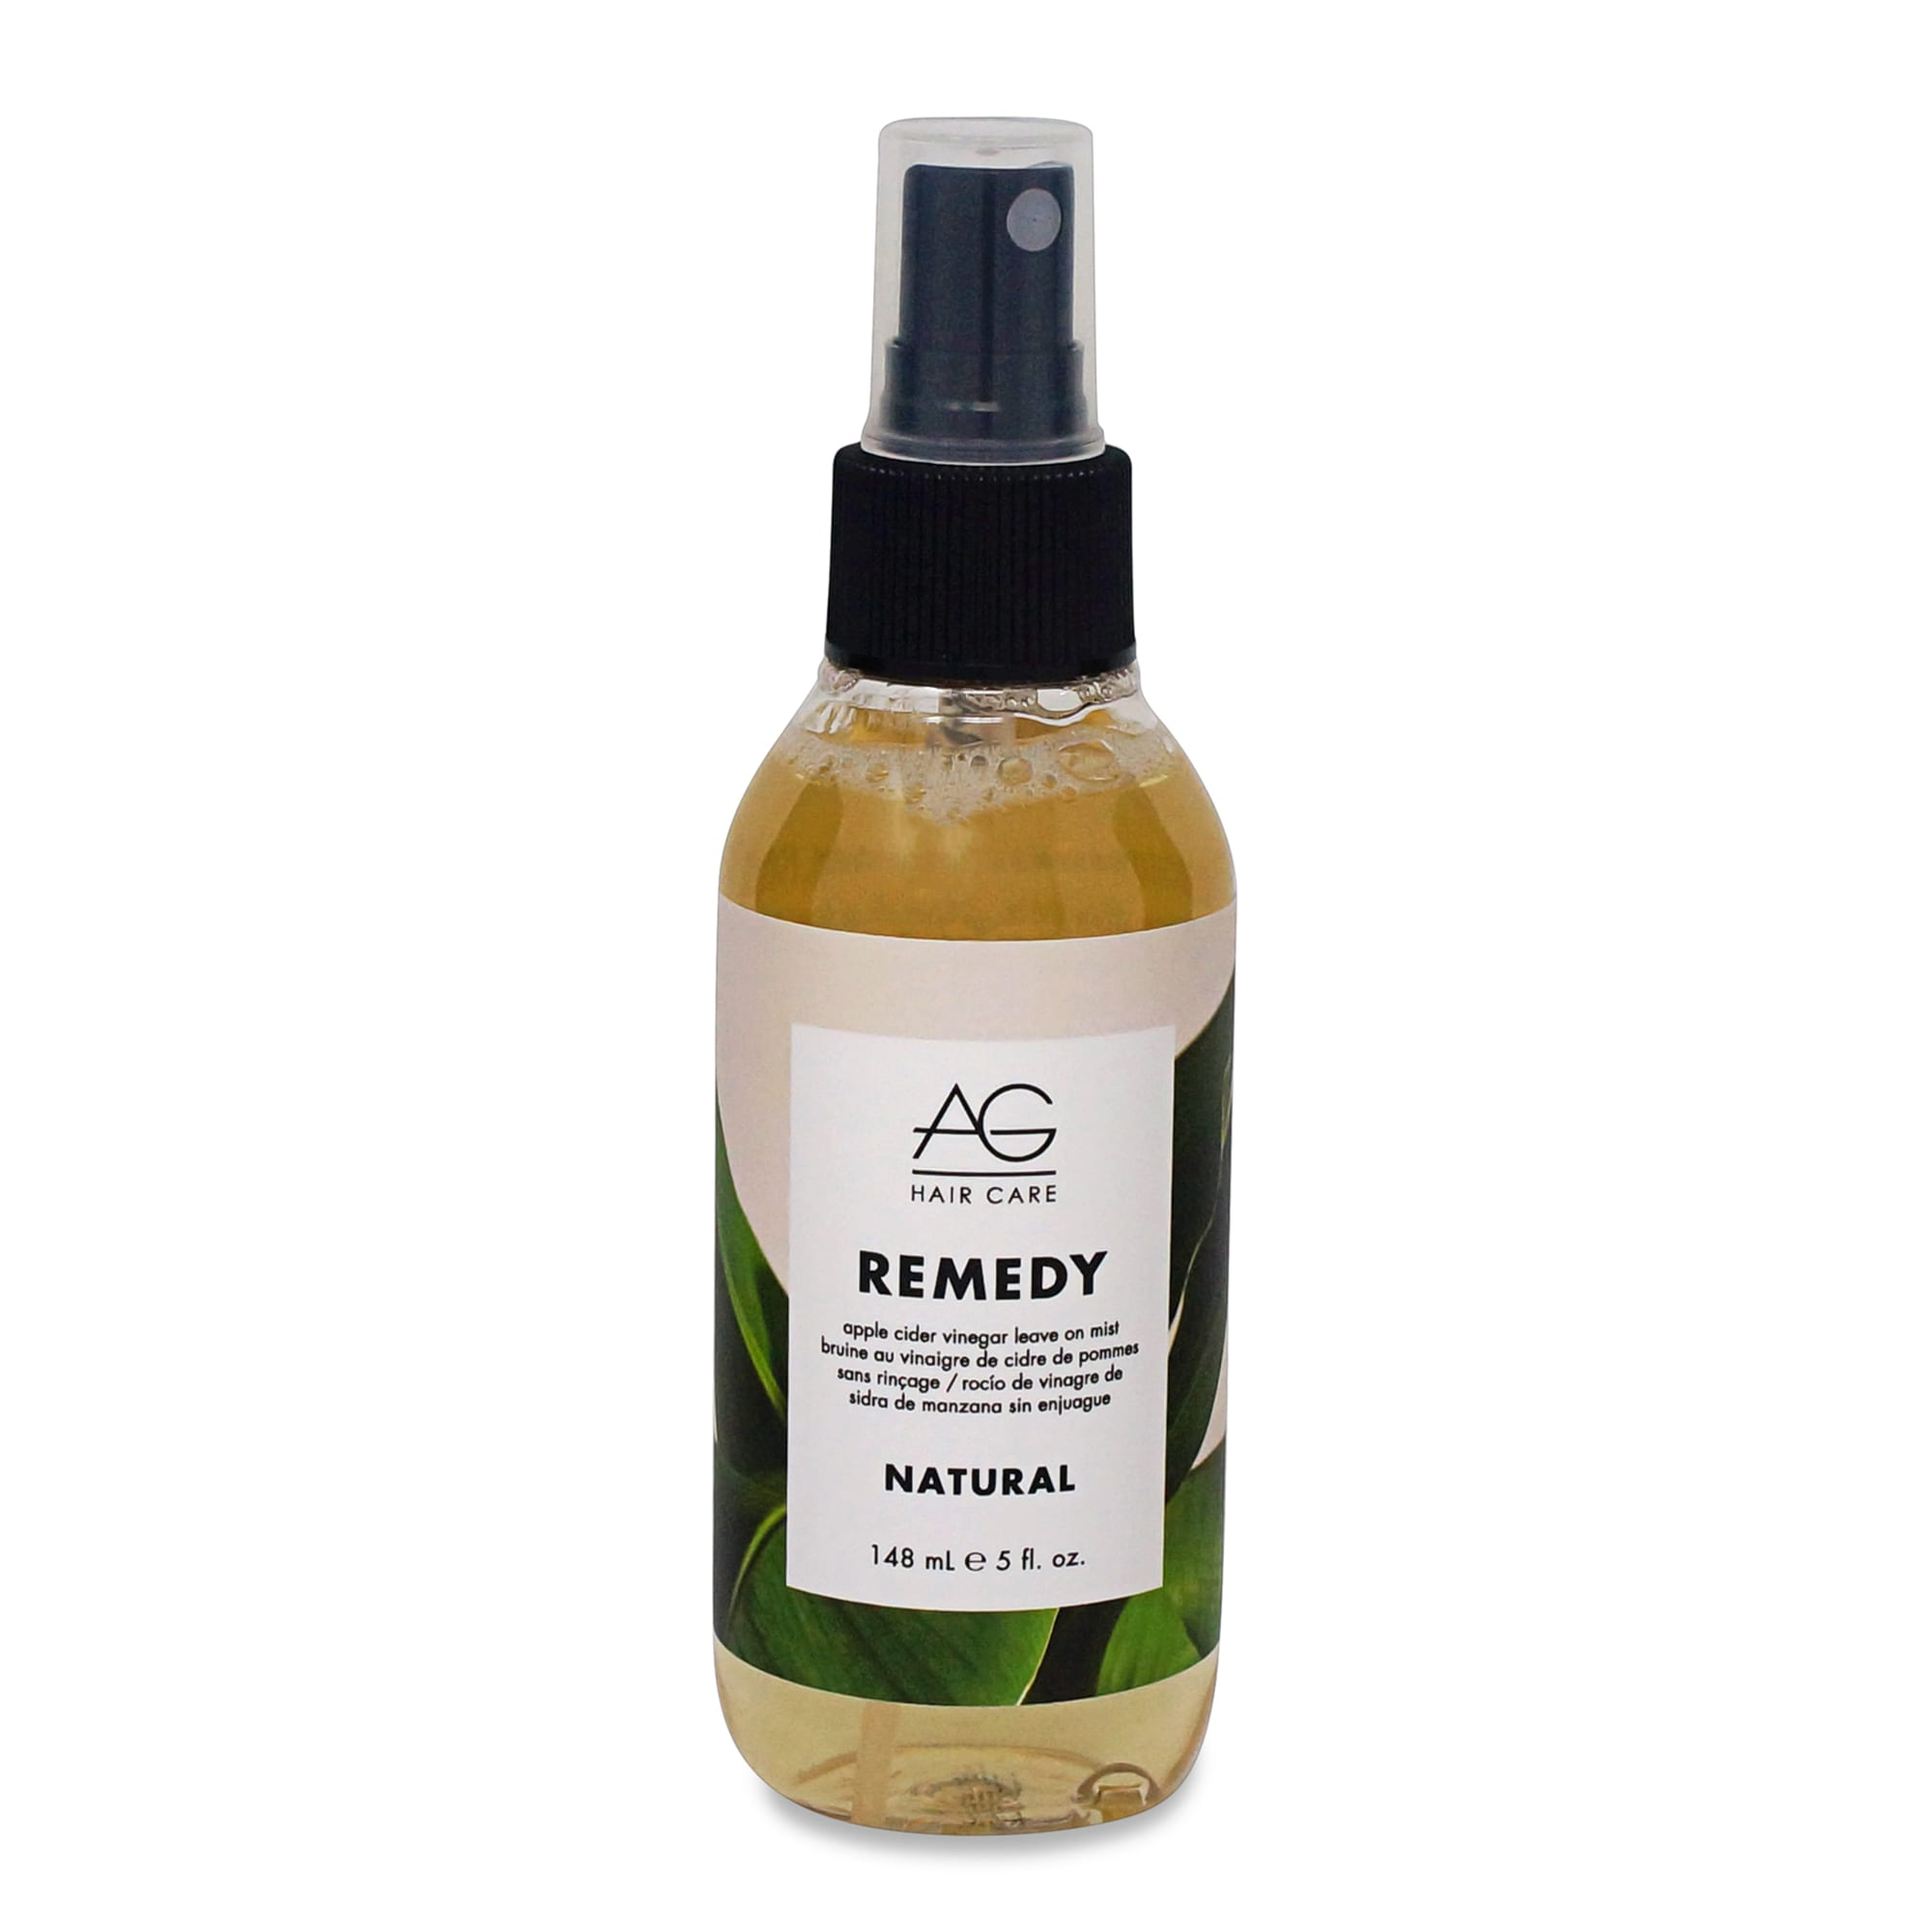 AG Hair Natural Remedy Apple Cider Vinegar Leave-on Mist